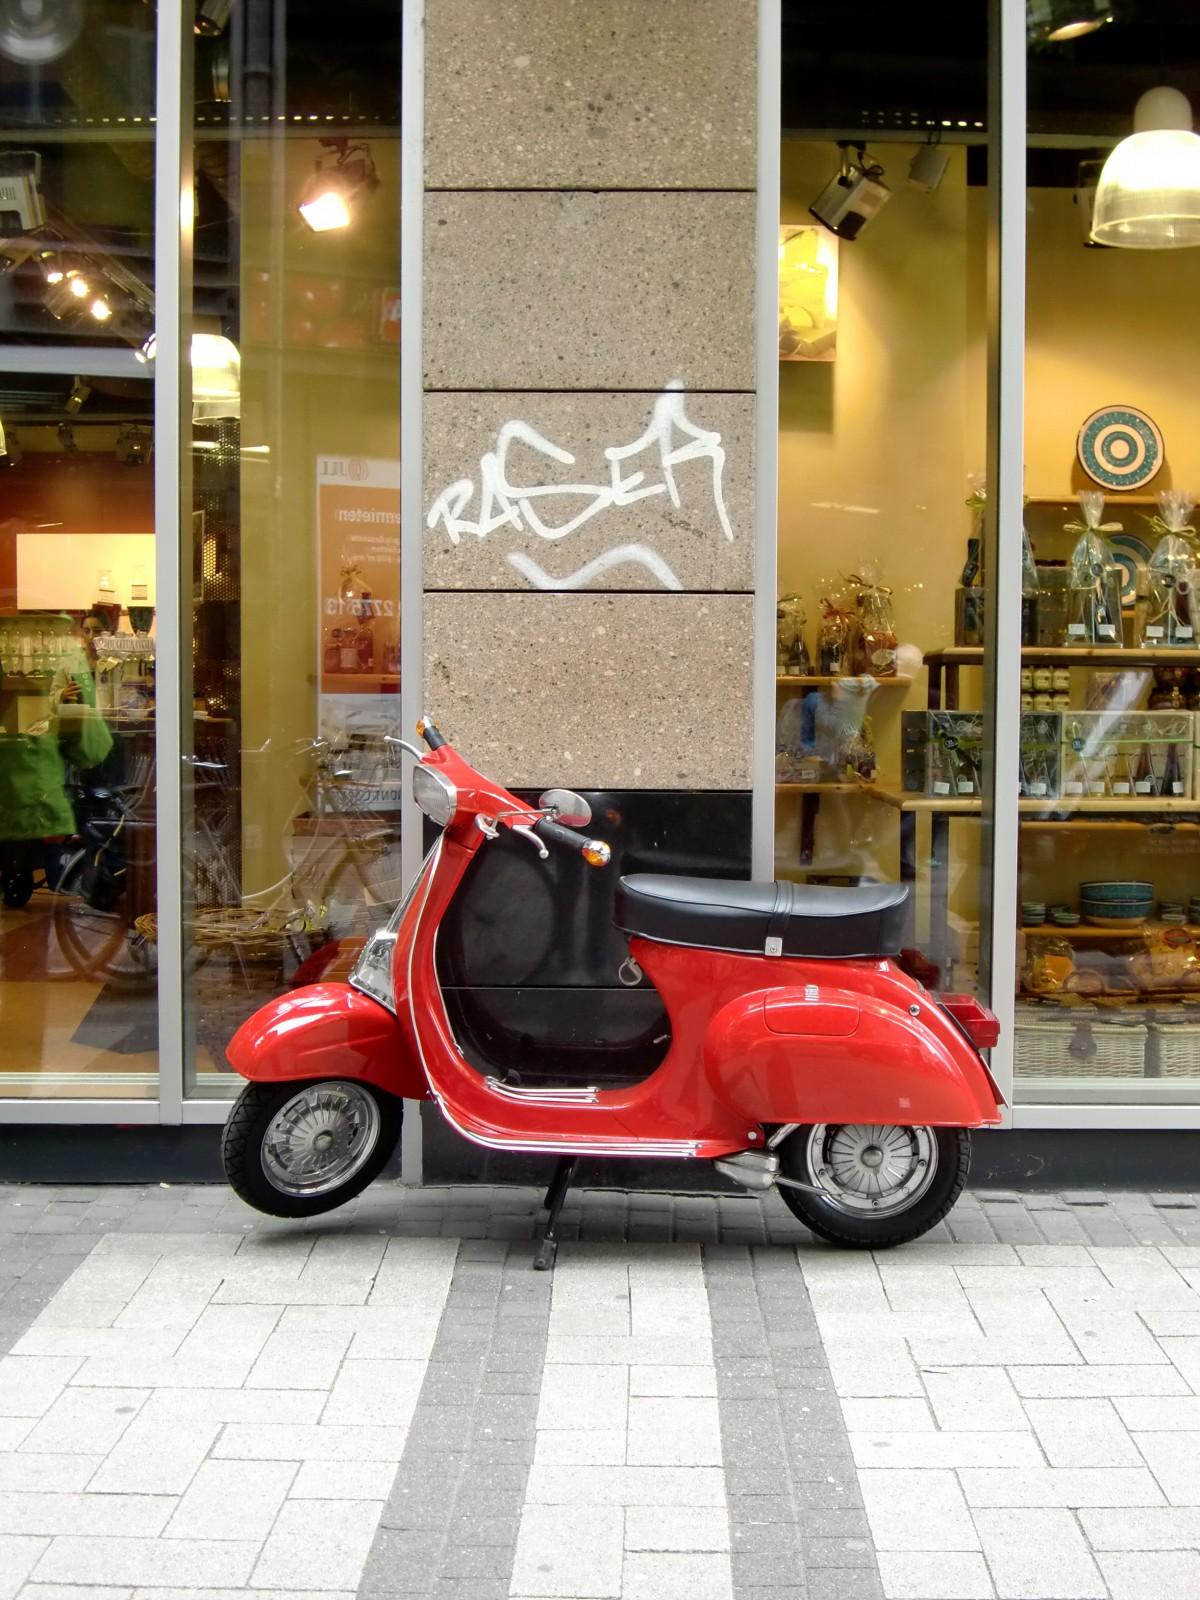 free images car retro vehicle motorcycle park motor. Black Bedroom Furniture Sets. Home Design Ideas